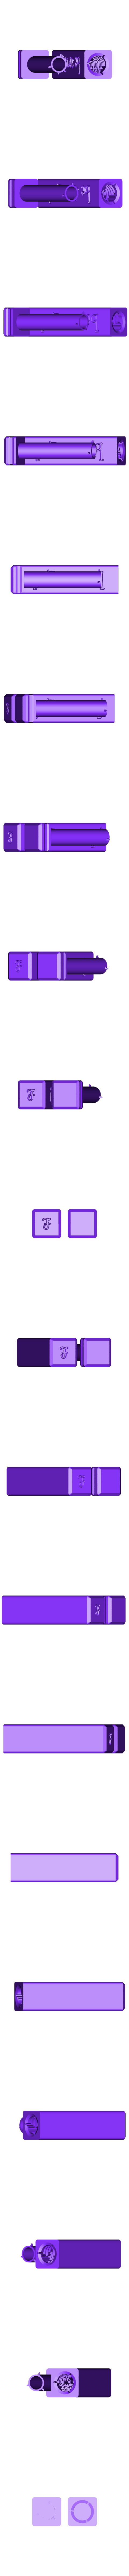 all-lottery-ticket-hard.stl Télécharger fichier STL gratuit Lottery ticket gift box • Plan imprimable en 3D, RevK